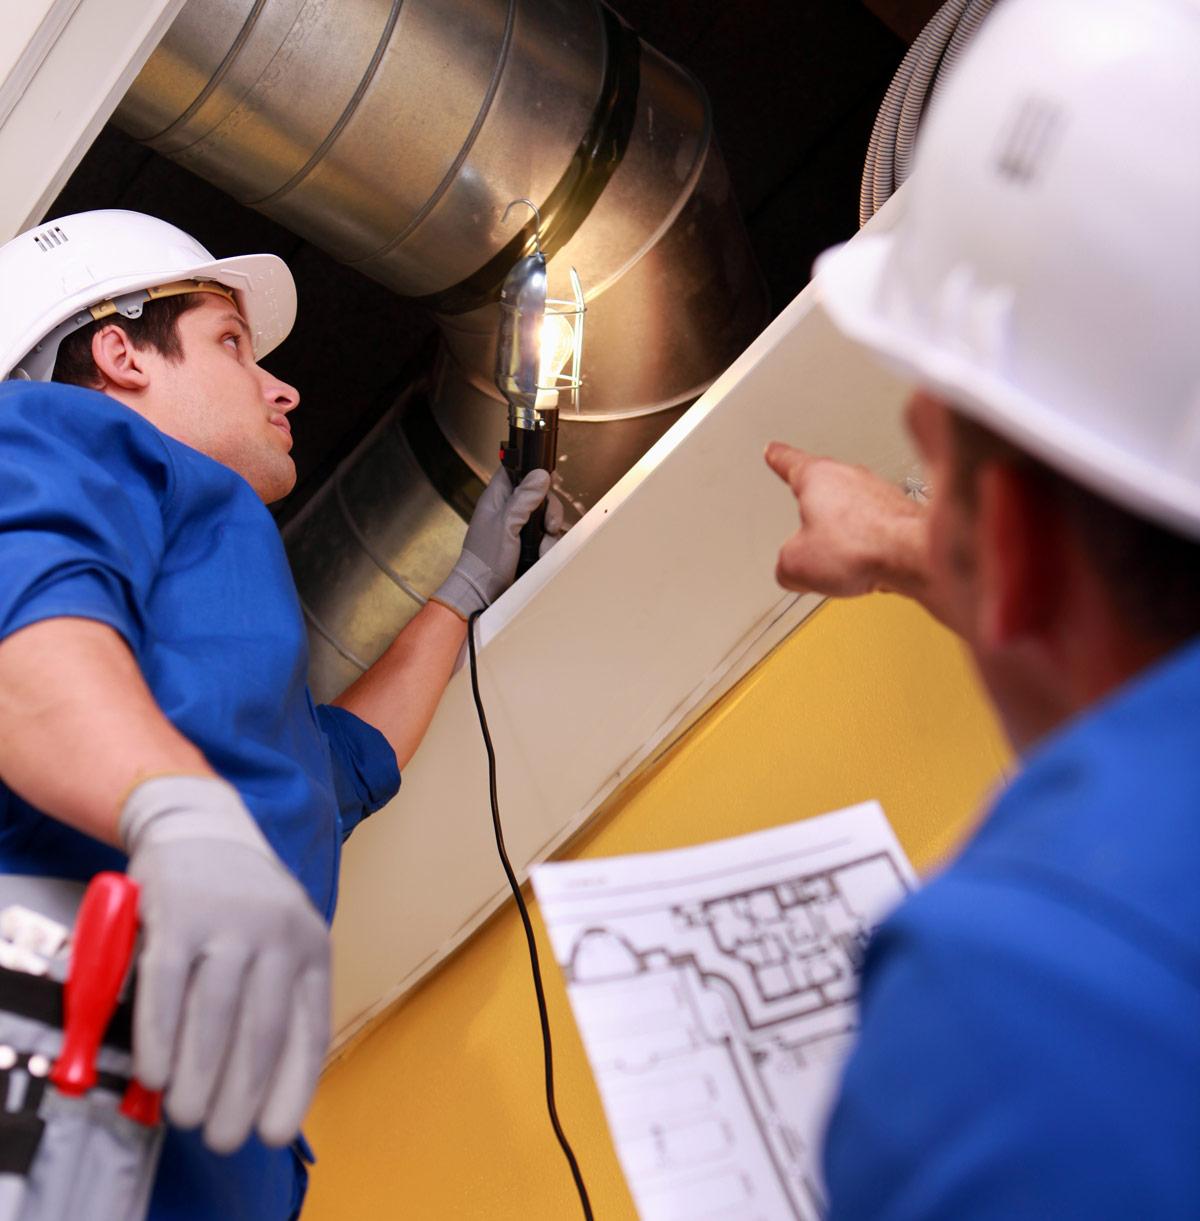 HVAC Maintenance in Fort Lauderdale, Boca Raton, Coral Springs